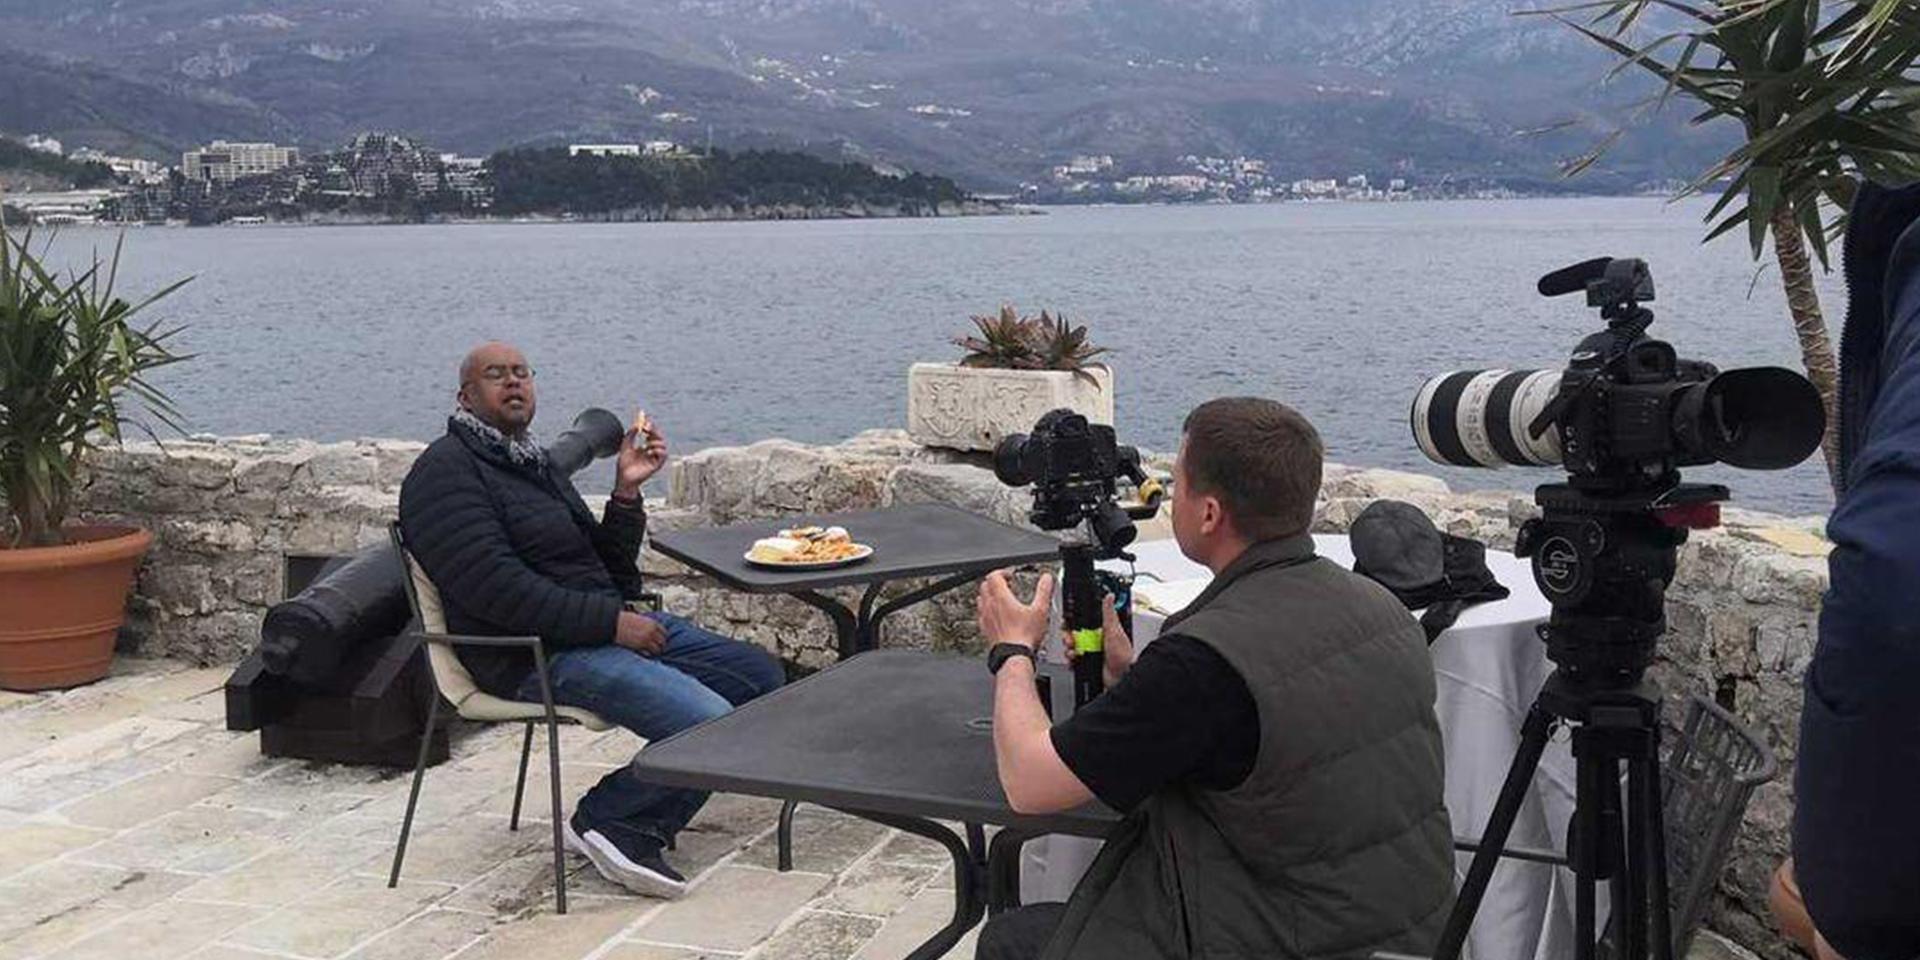 budva-Montenegro budva-nightlife budva-hotels montenegro adriatic-sea